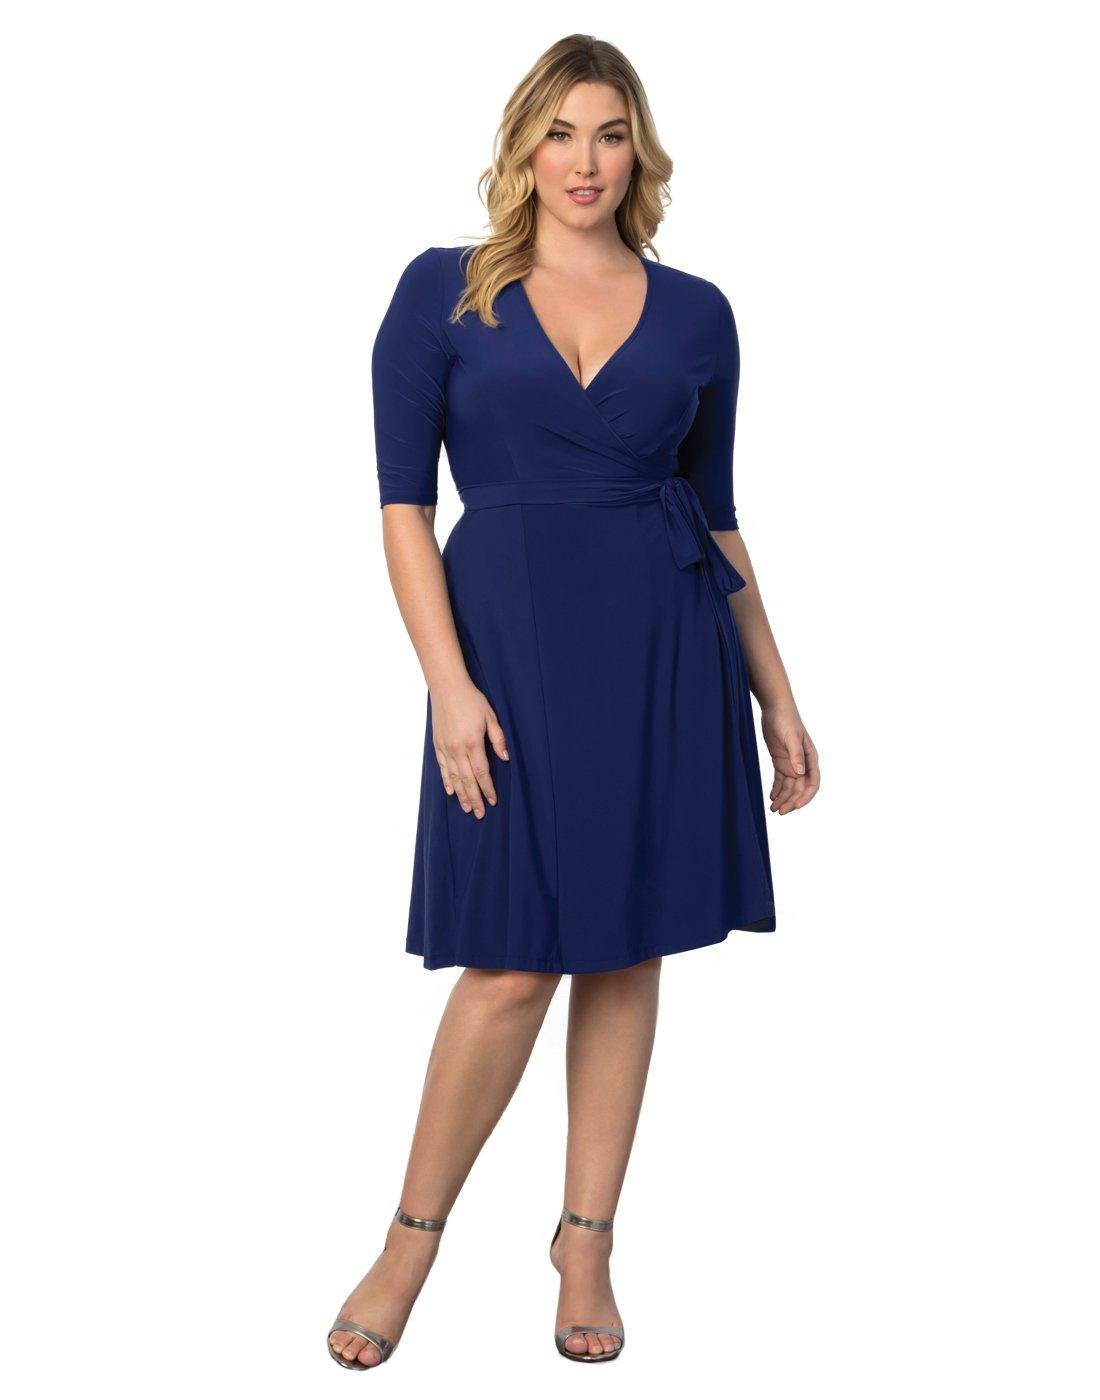 Kiyonna Women's Plus Size Essential Wrap Dress 0X Cobalt Blue by Kiyonna